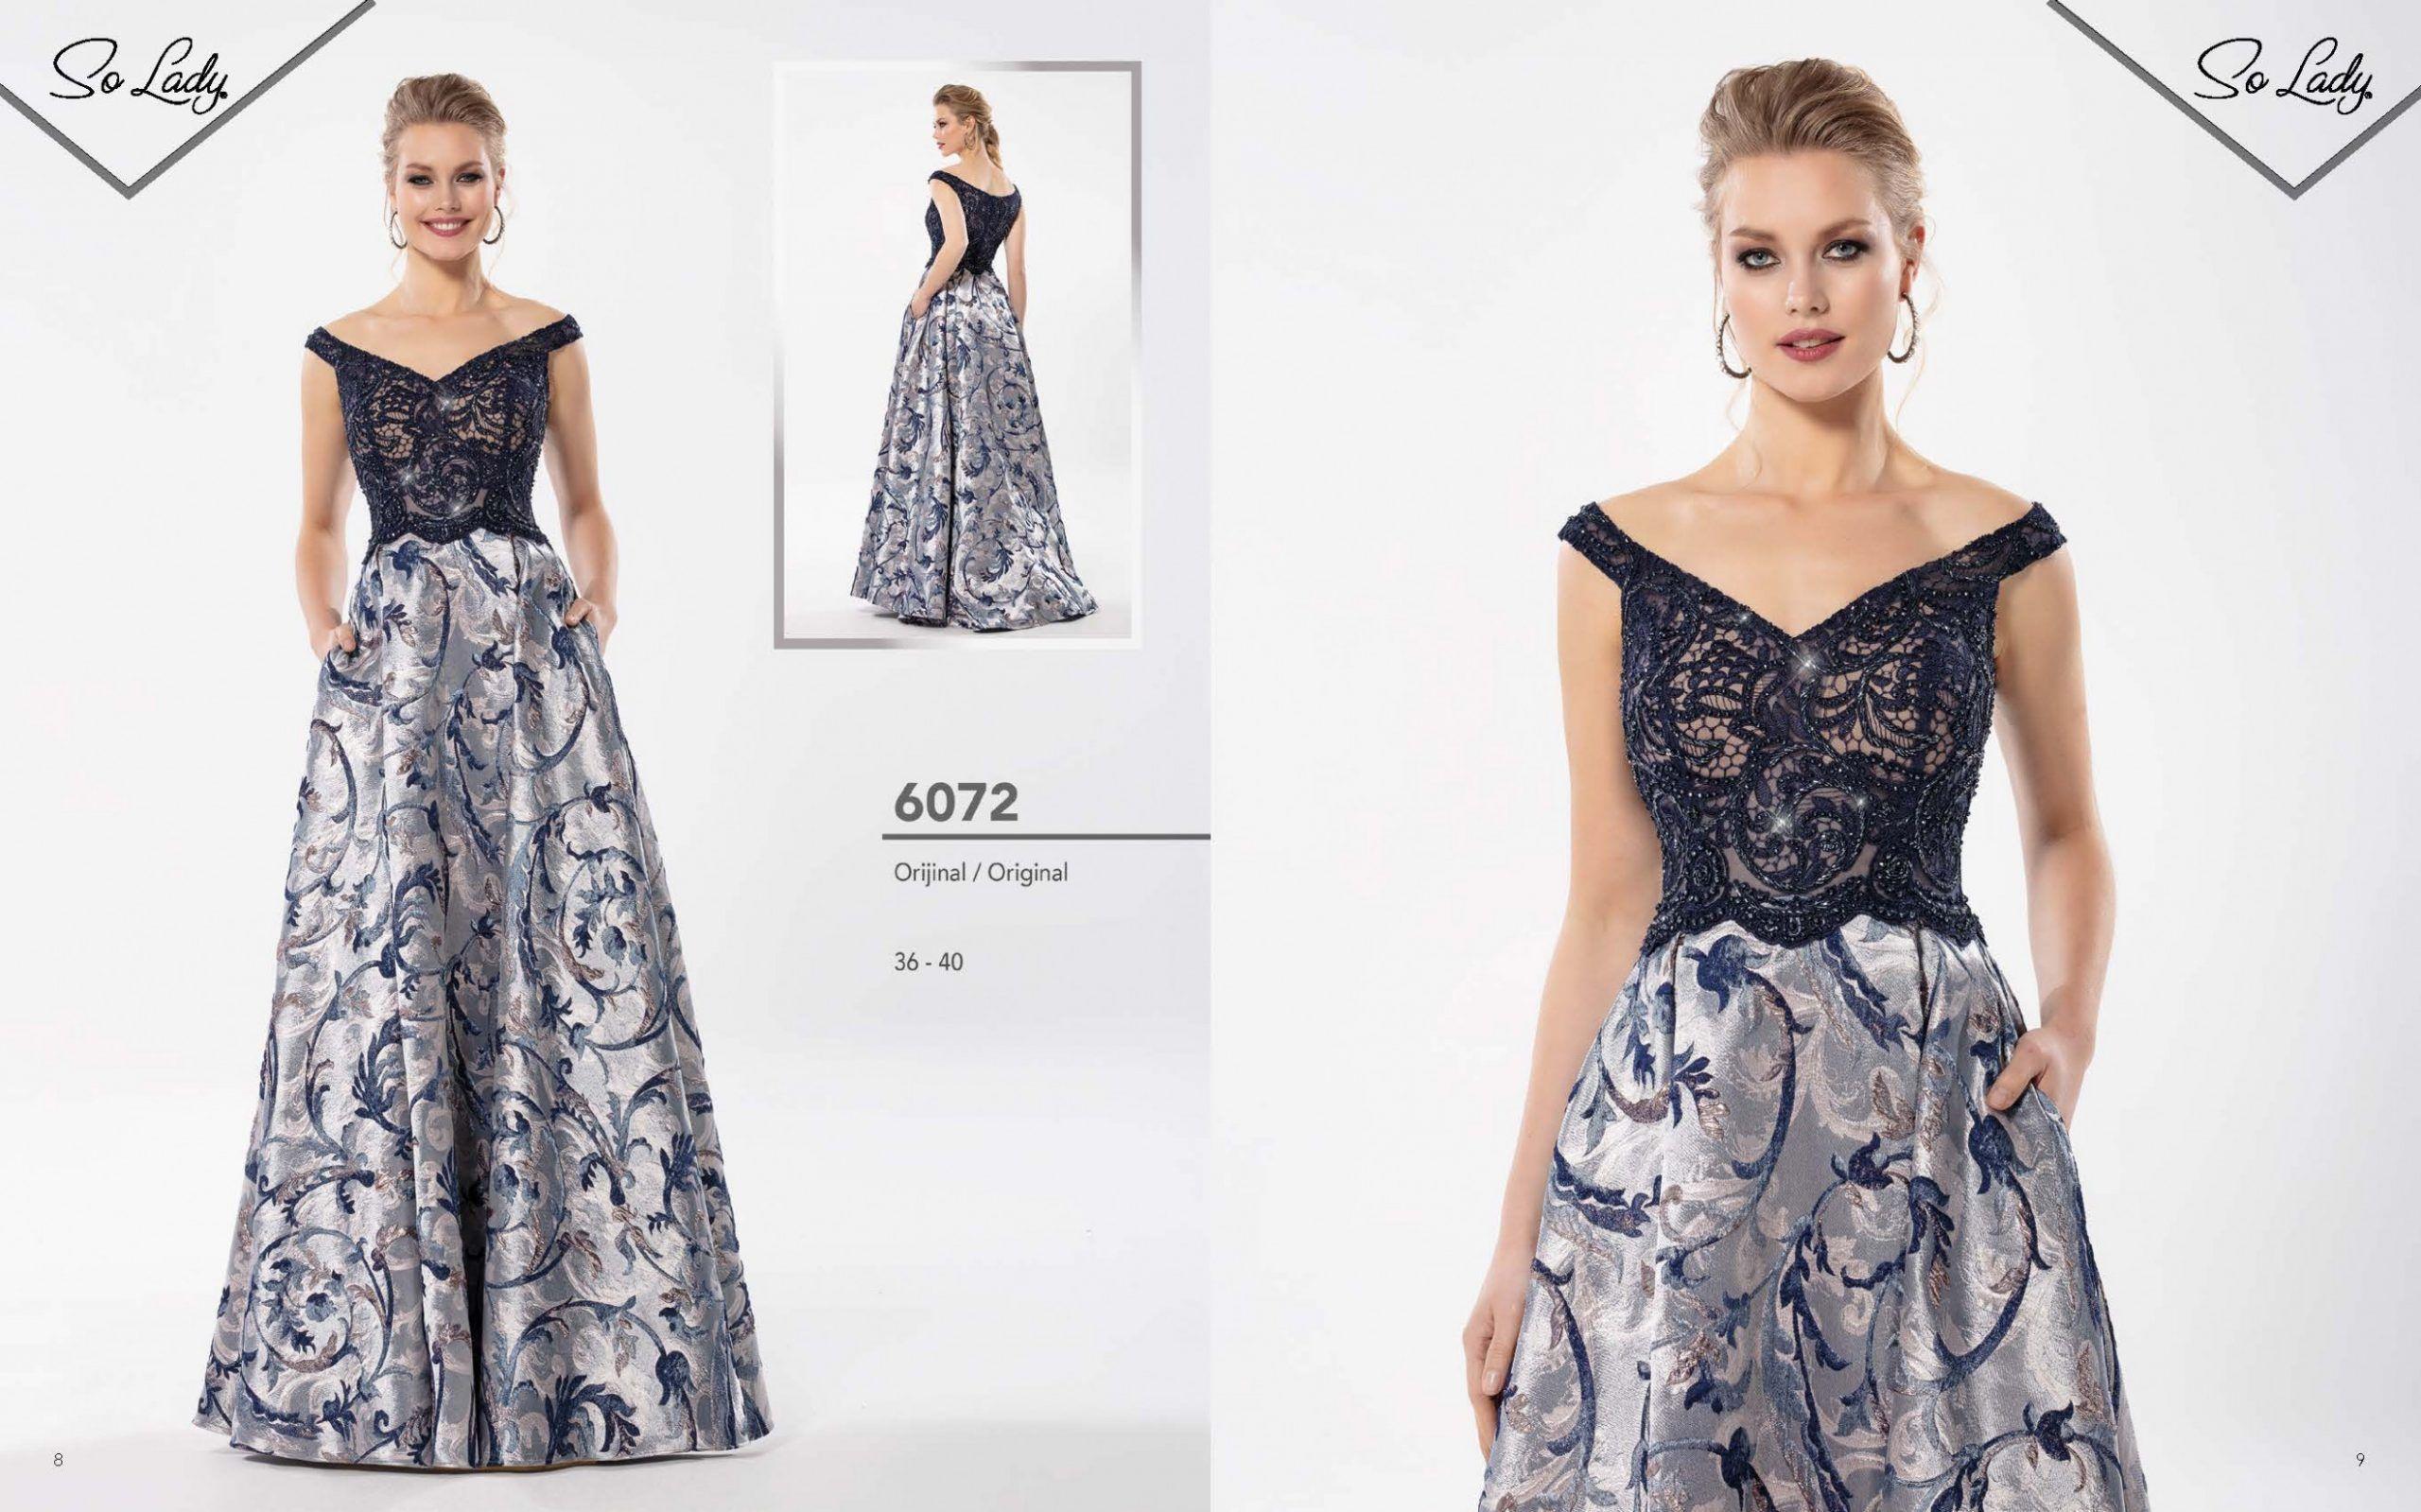 15 abendkleider nürnberg in 2020 | abendkleid, kleider